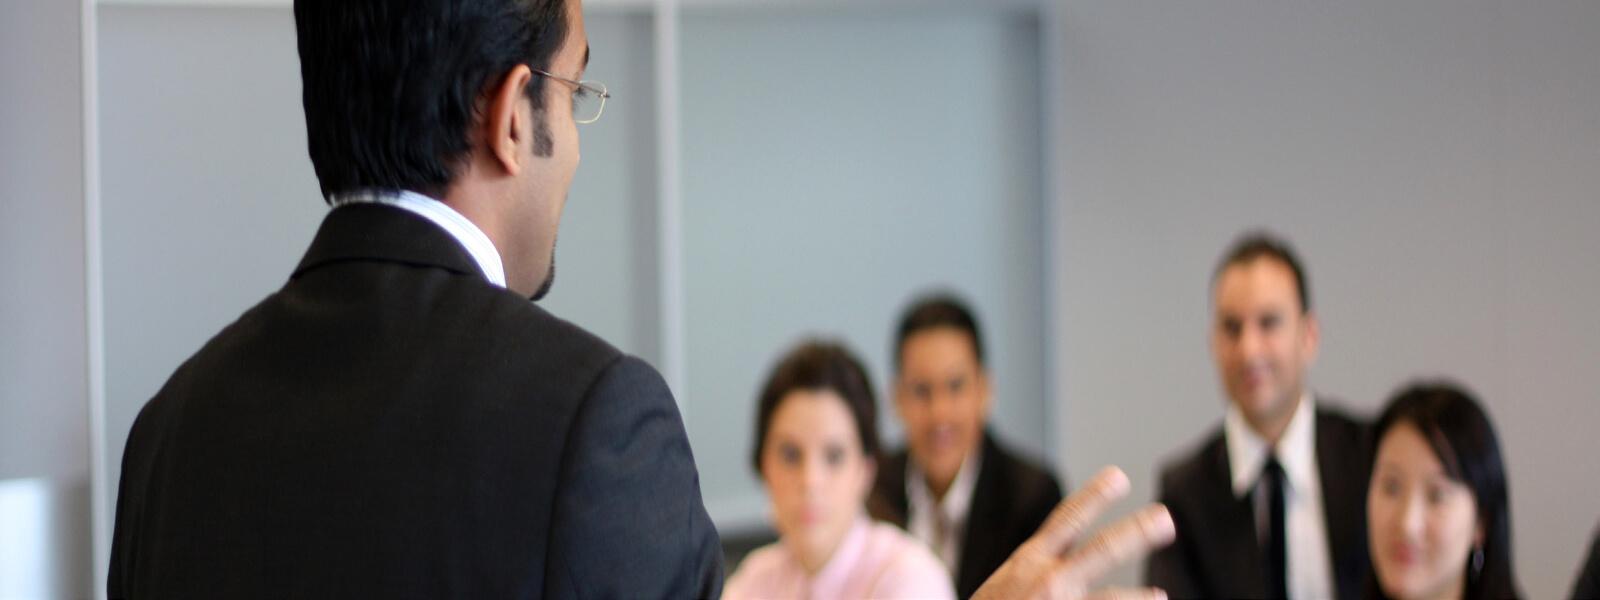 MBA master in Sport Business Management-wittenborg -studyinholland-universitiesofappliedsciences-wittenborg-amsterdam-holland